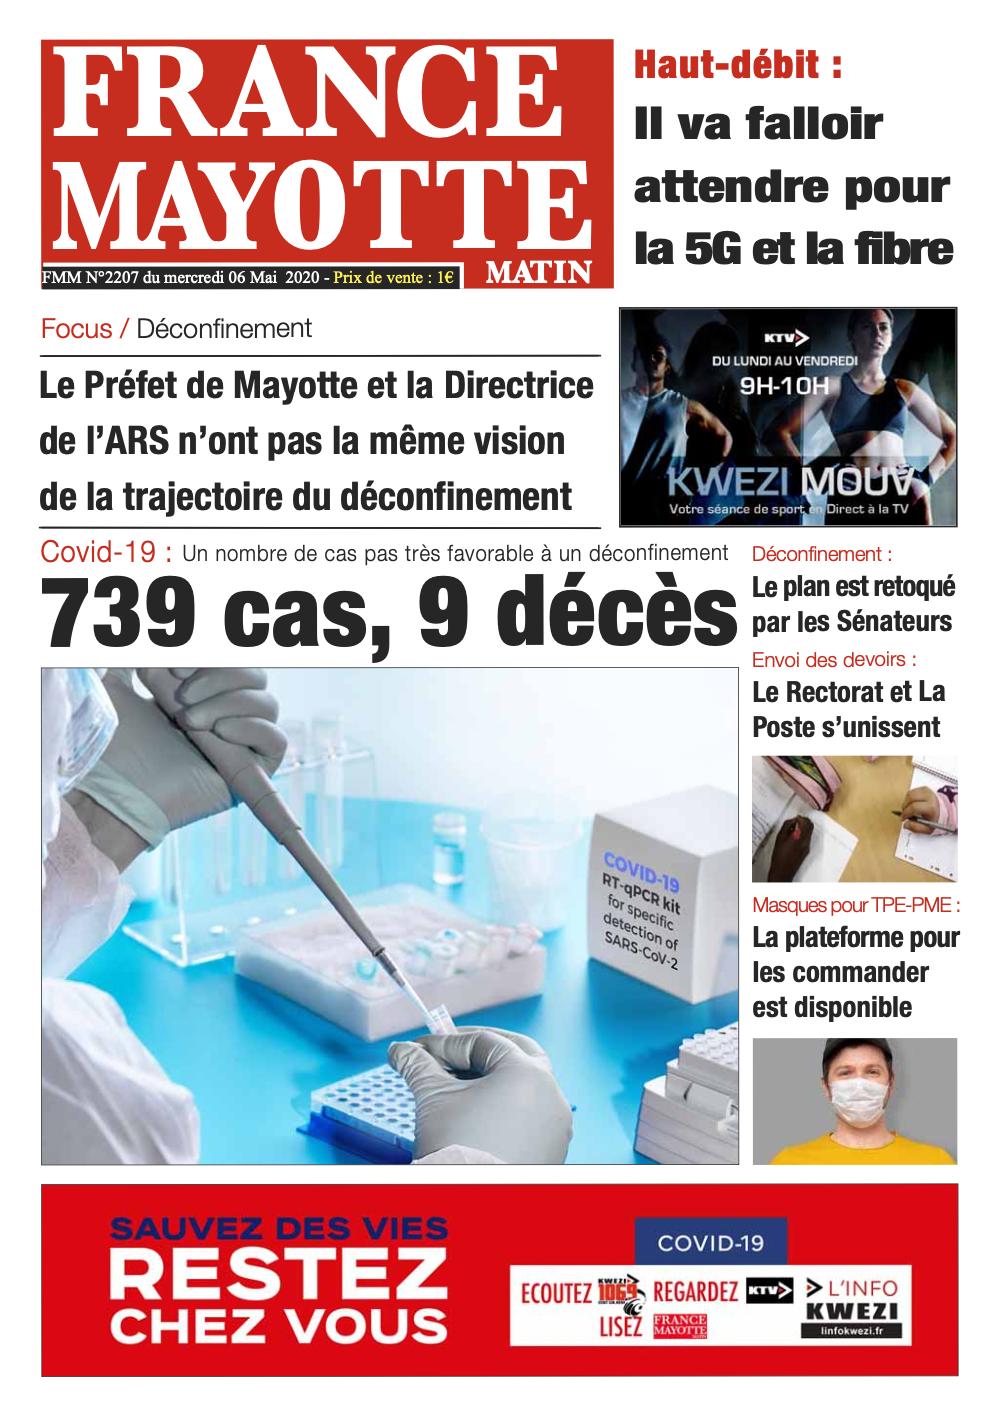 France Mayotte Mercredi 6 mai 2020